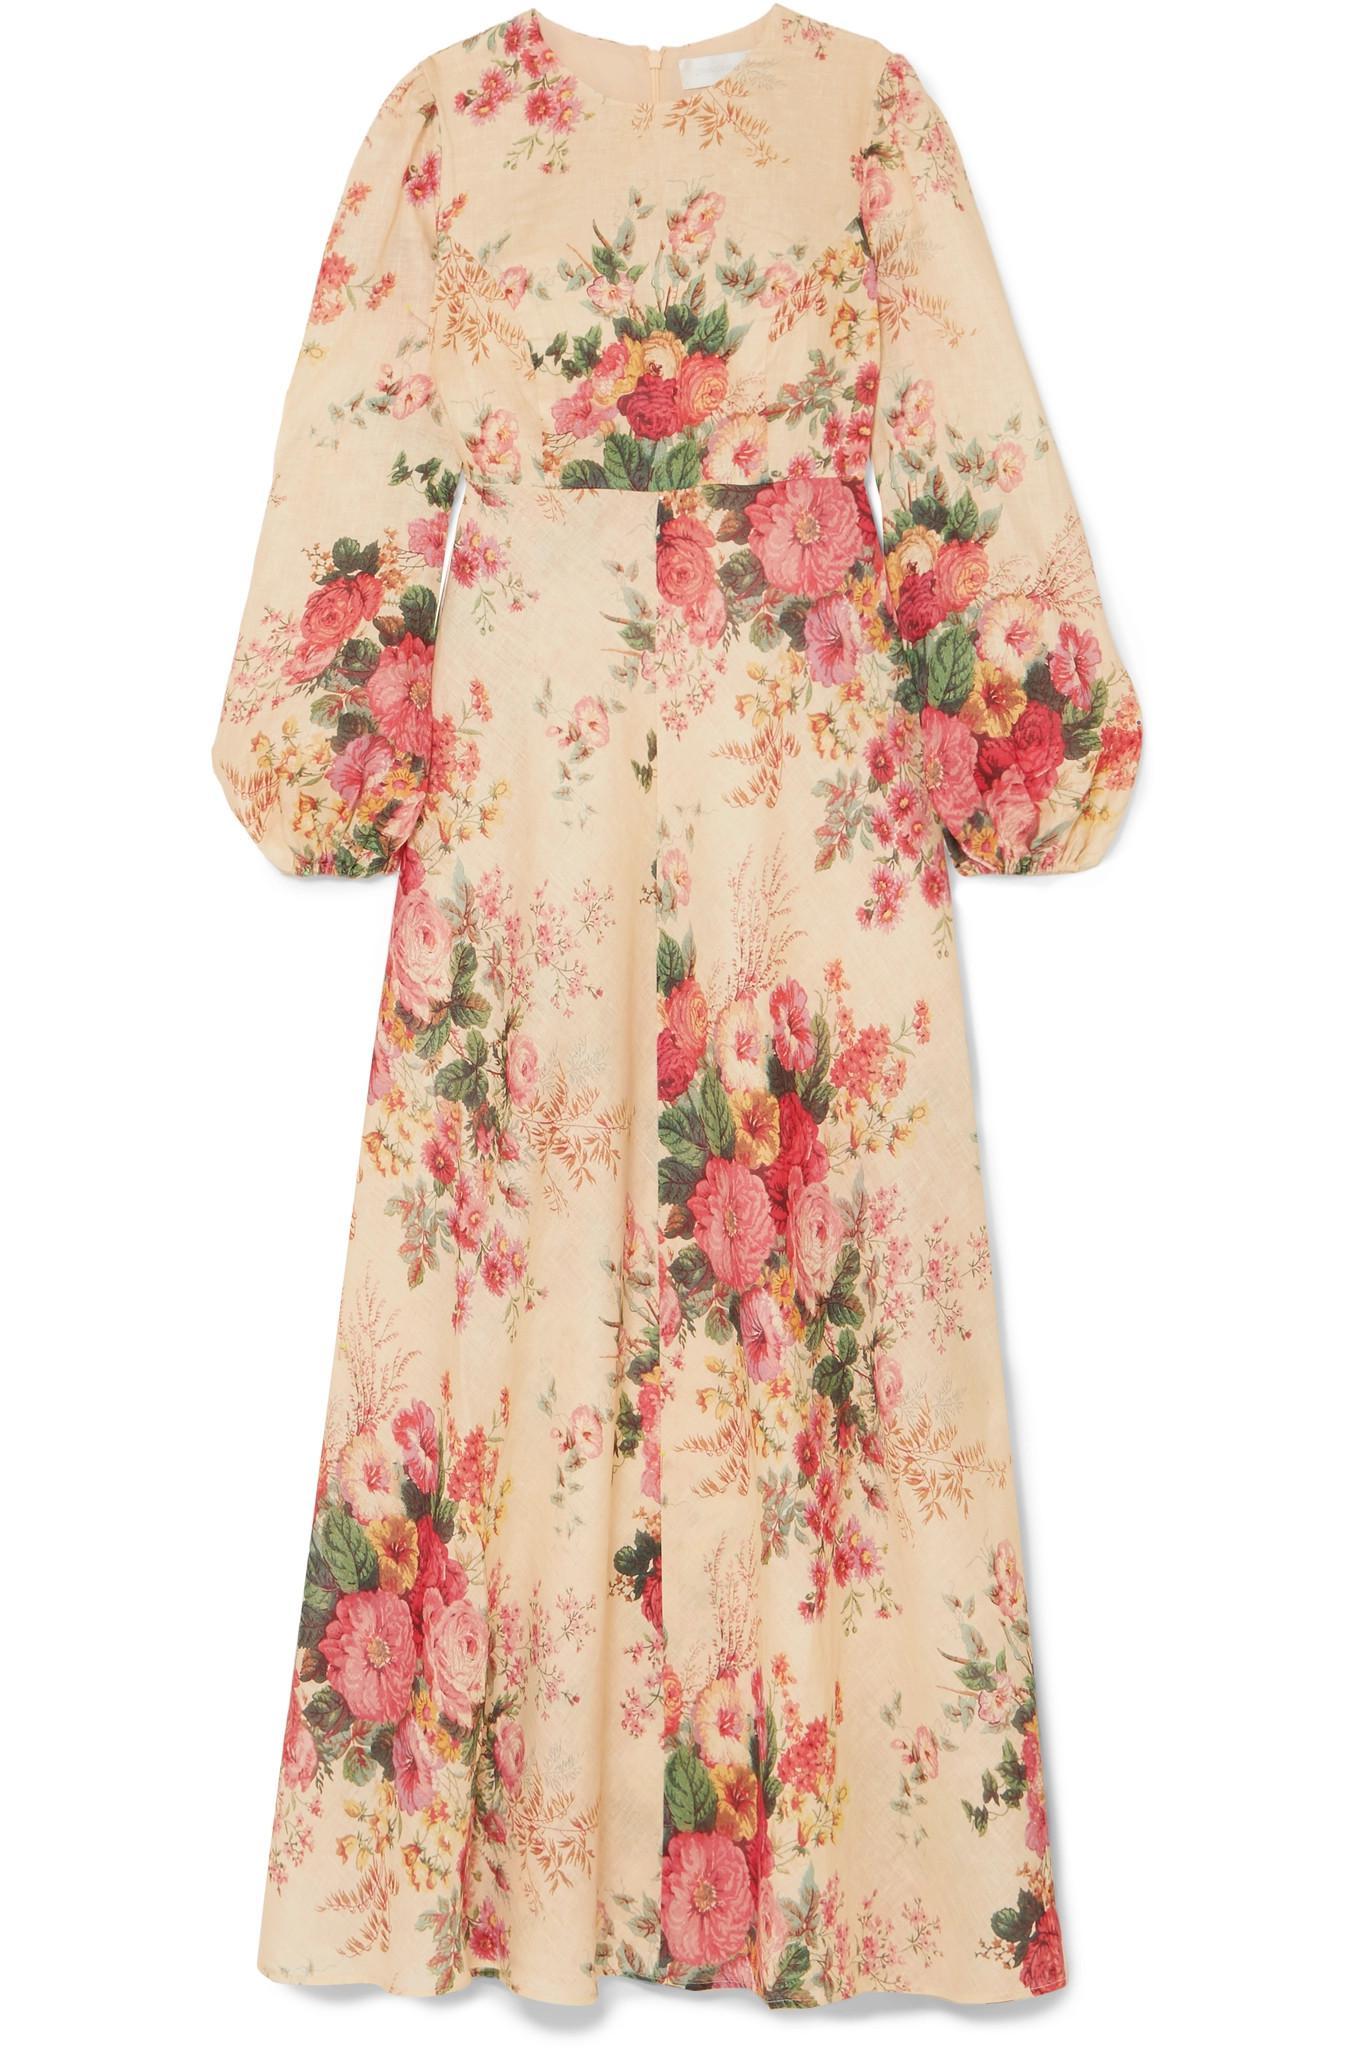 405a0f9b465 Zimmermann Laelia Floral-print Linen Maxi Dress in Pink - Lyst